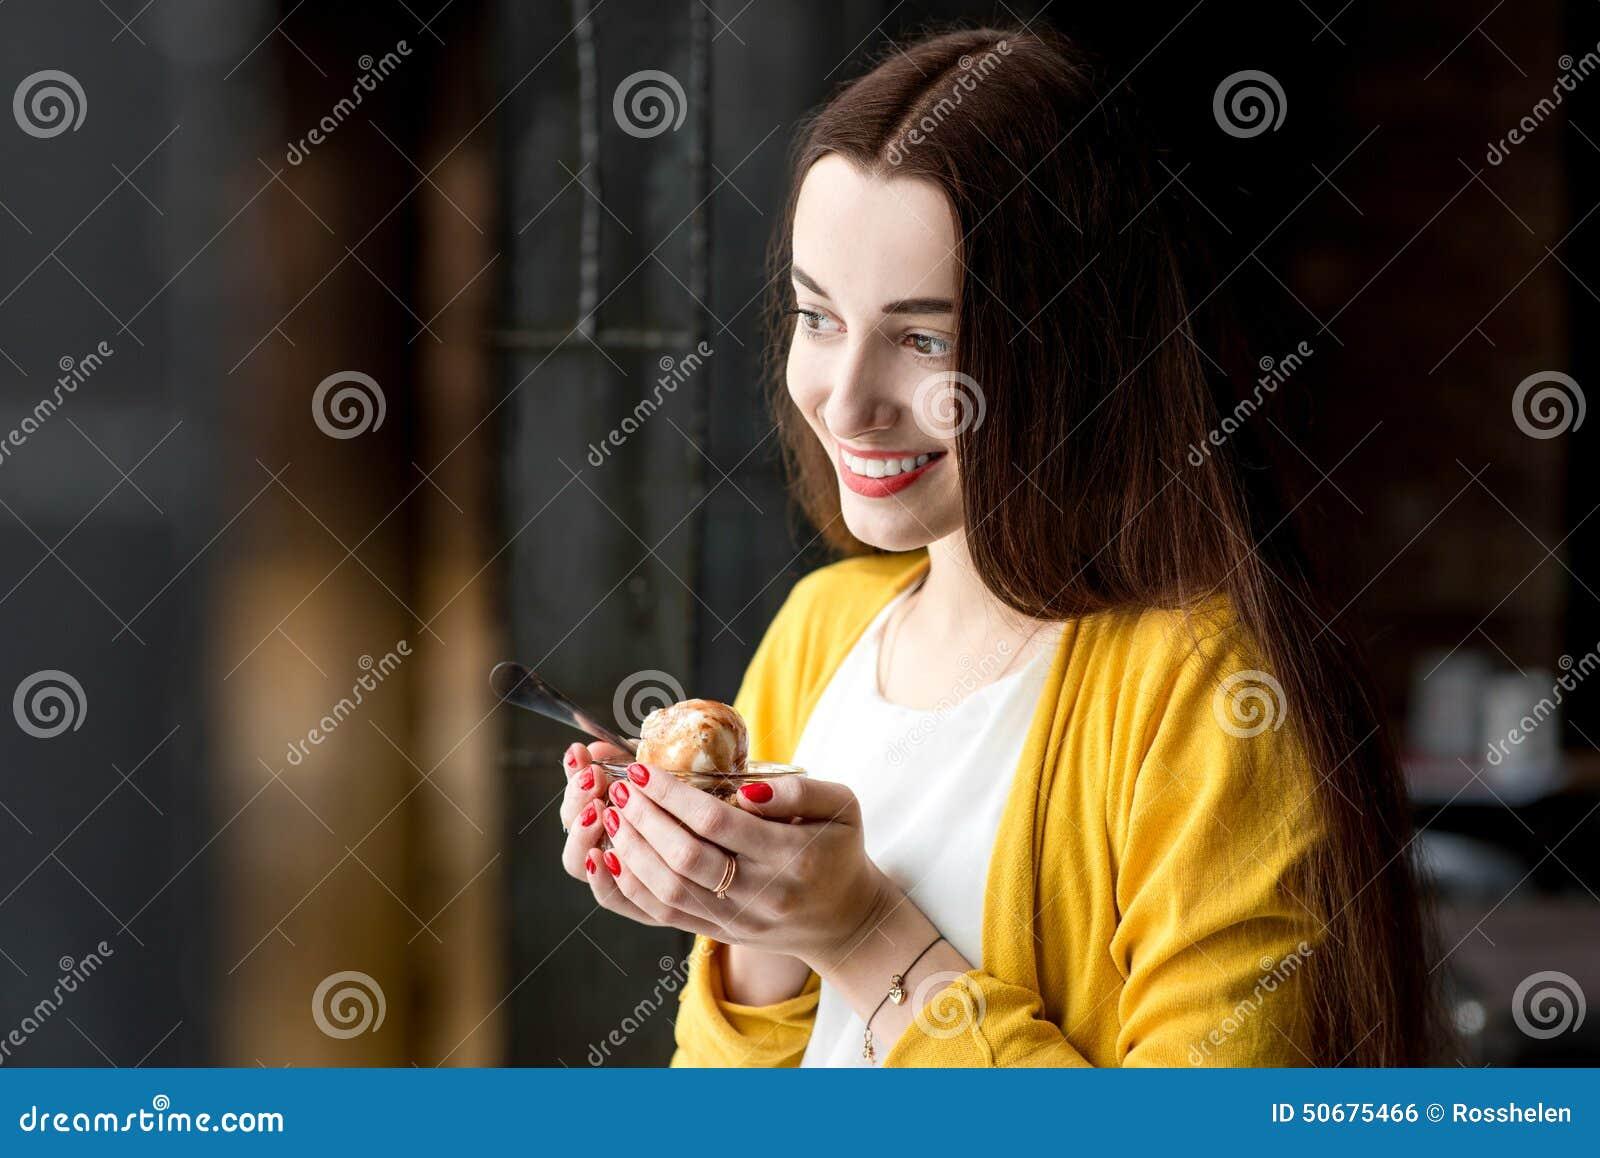 Download 吃在咖啡馆的妇女冰淇凌 库存照片. 图片 包括有 投反对票, 成人, 咖啡馆, 人们, 黑暗, 夫人, 有吸引力的 - 50675466